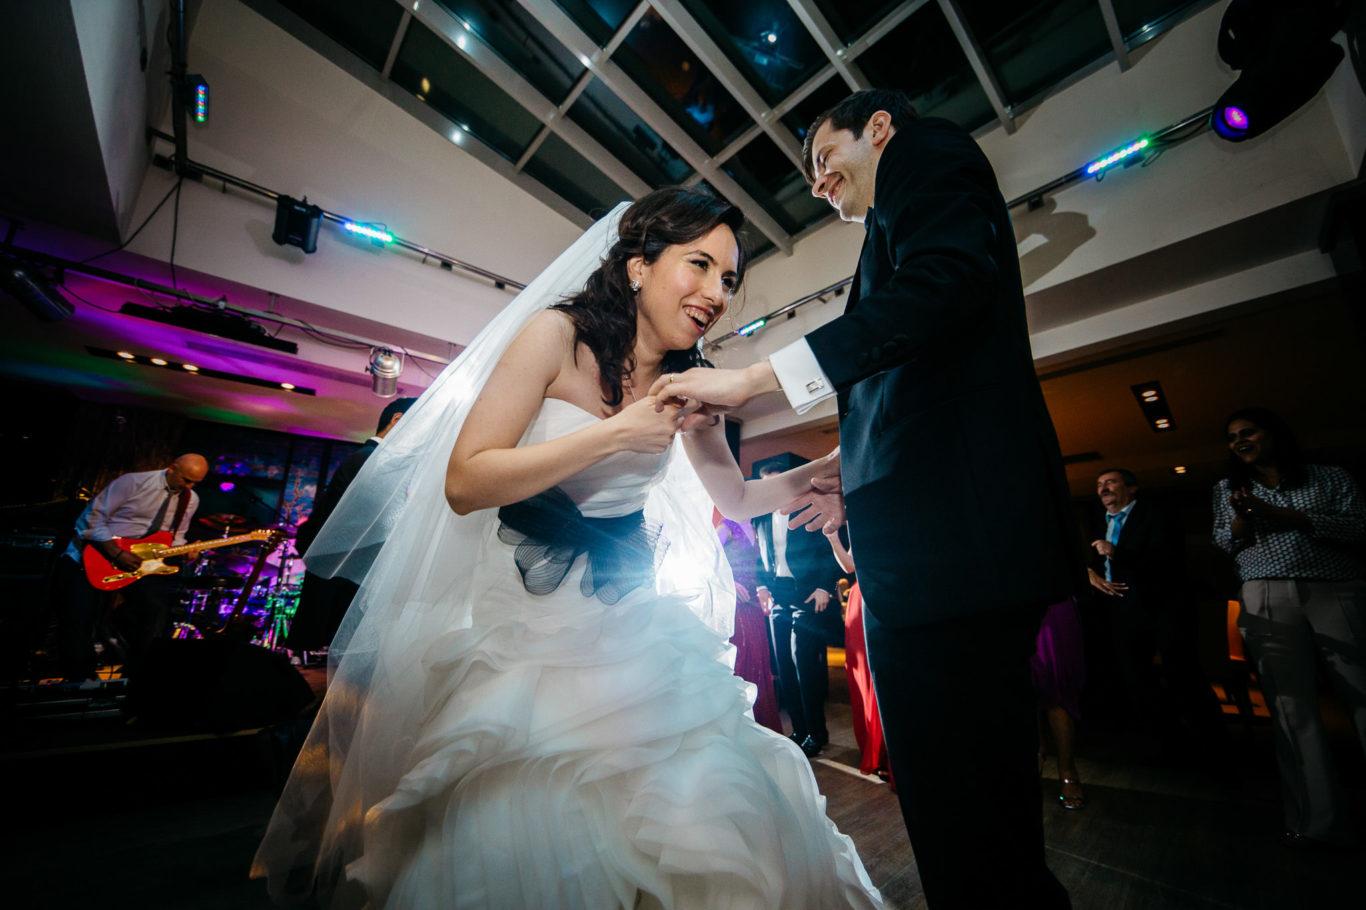 0840-Fotografie-nunta-Simona-Valentin-fotograf-Ciprian-Dumitrescu-CDF_0896 (2)